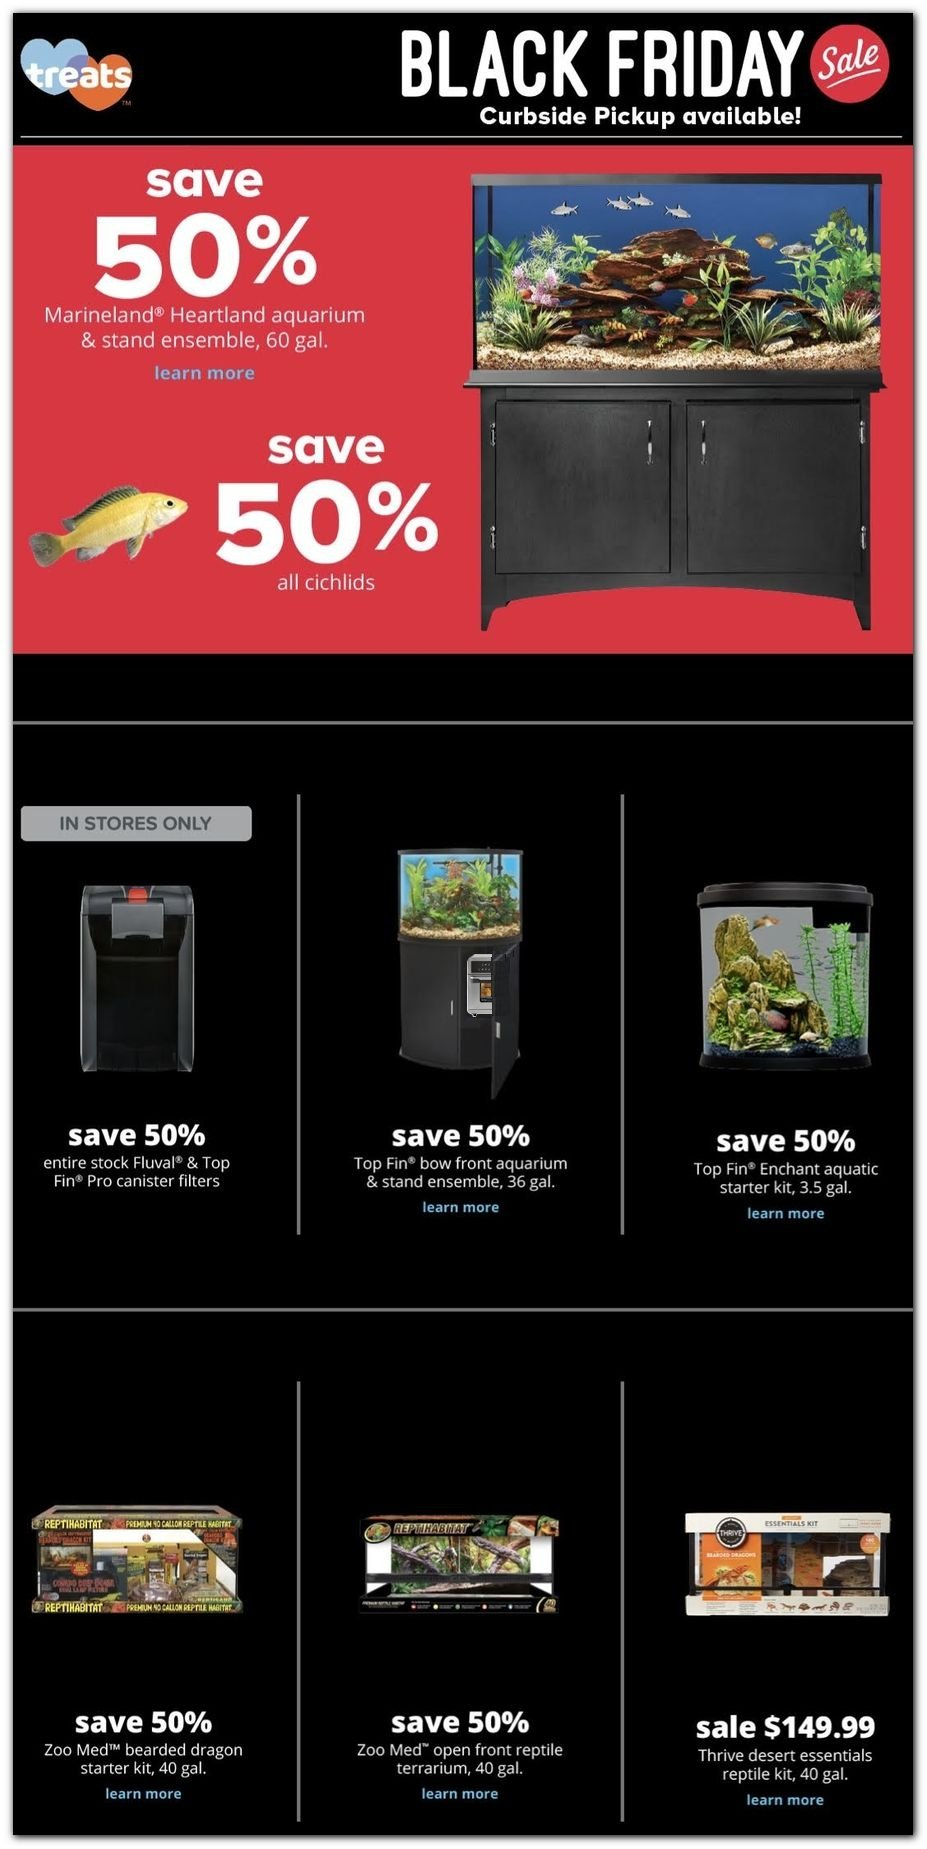 PetSmart Black Friday 2020 Page 8